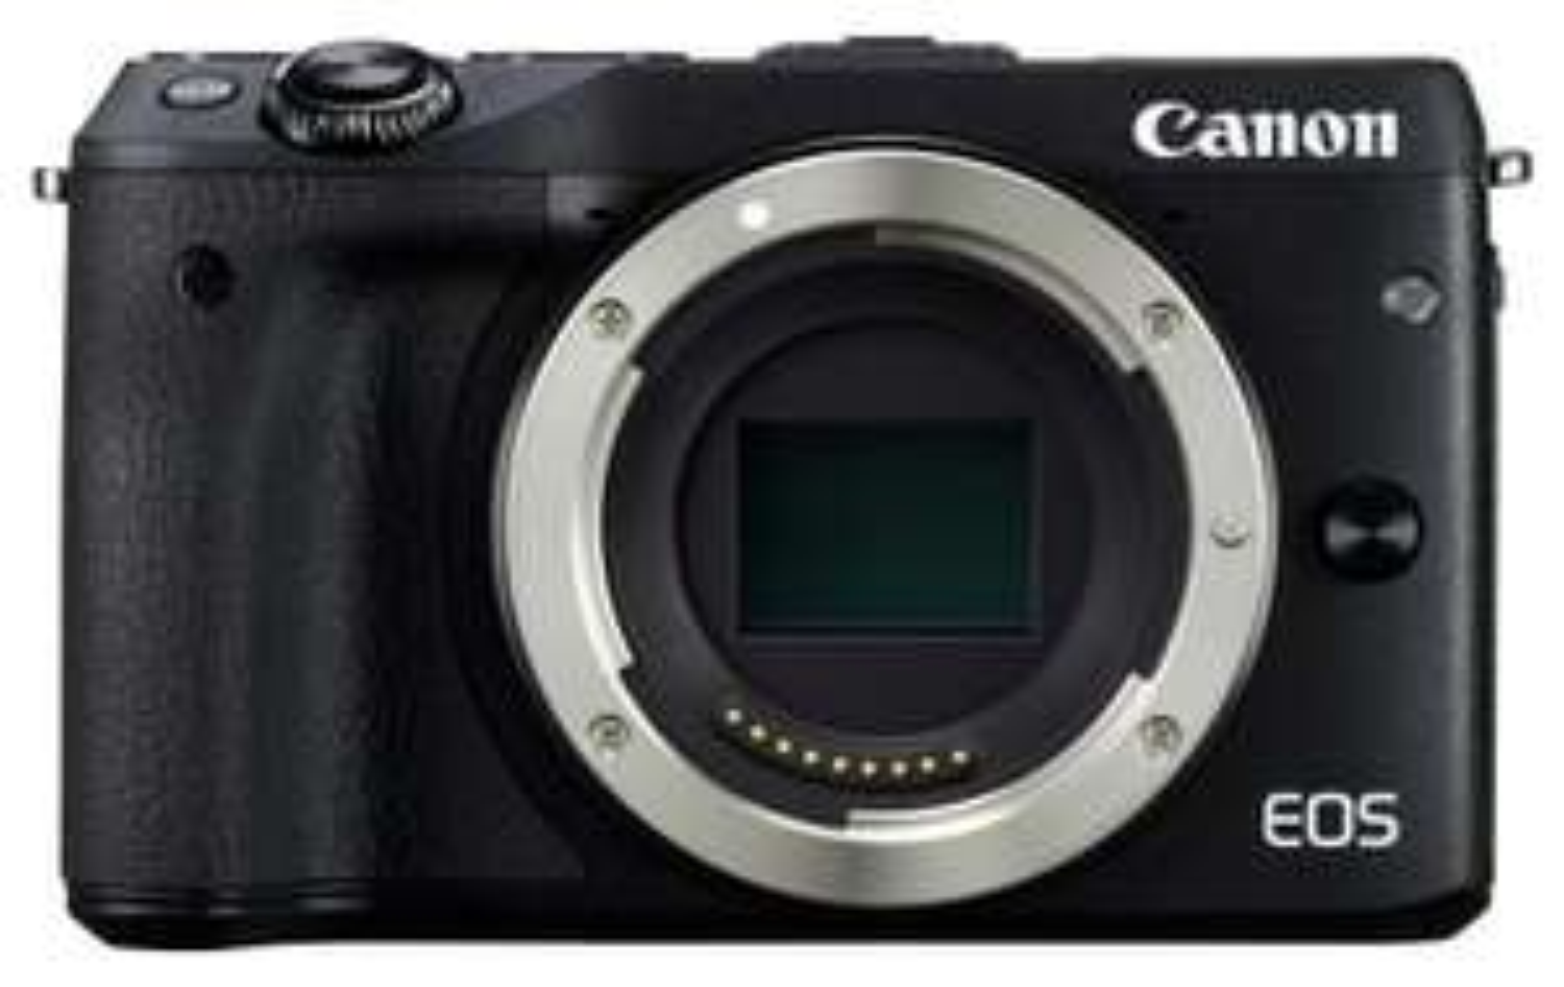 Canon EOS M3 Systemkamera (24 MP APS-CCMOS-Sensor, WiFi, NFC, Full-HD, Gehäuse)